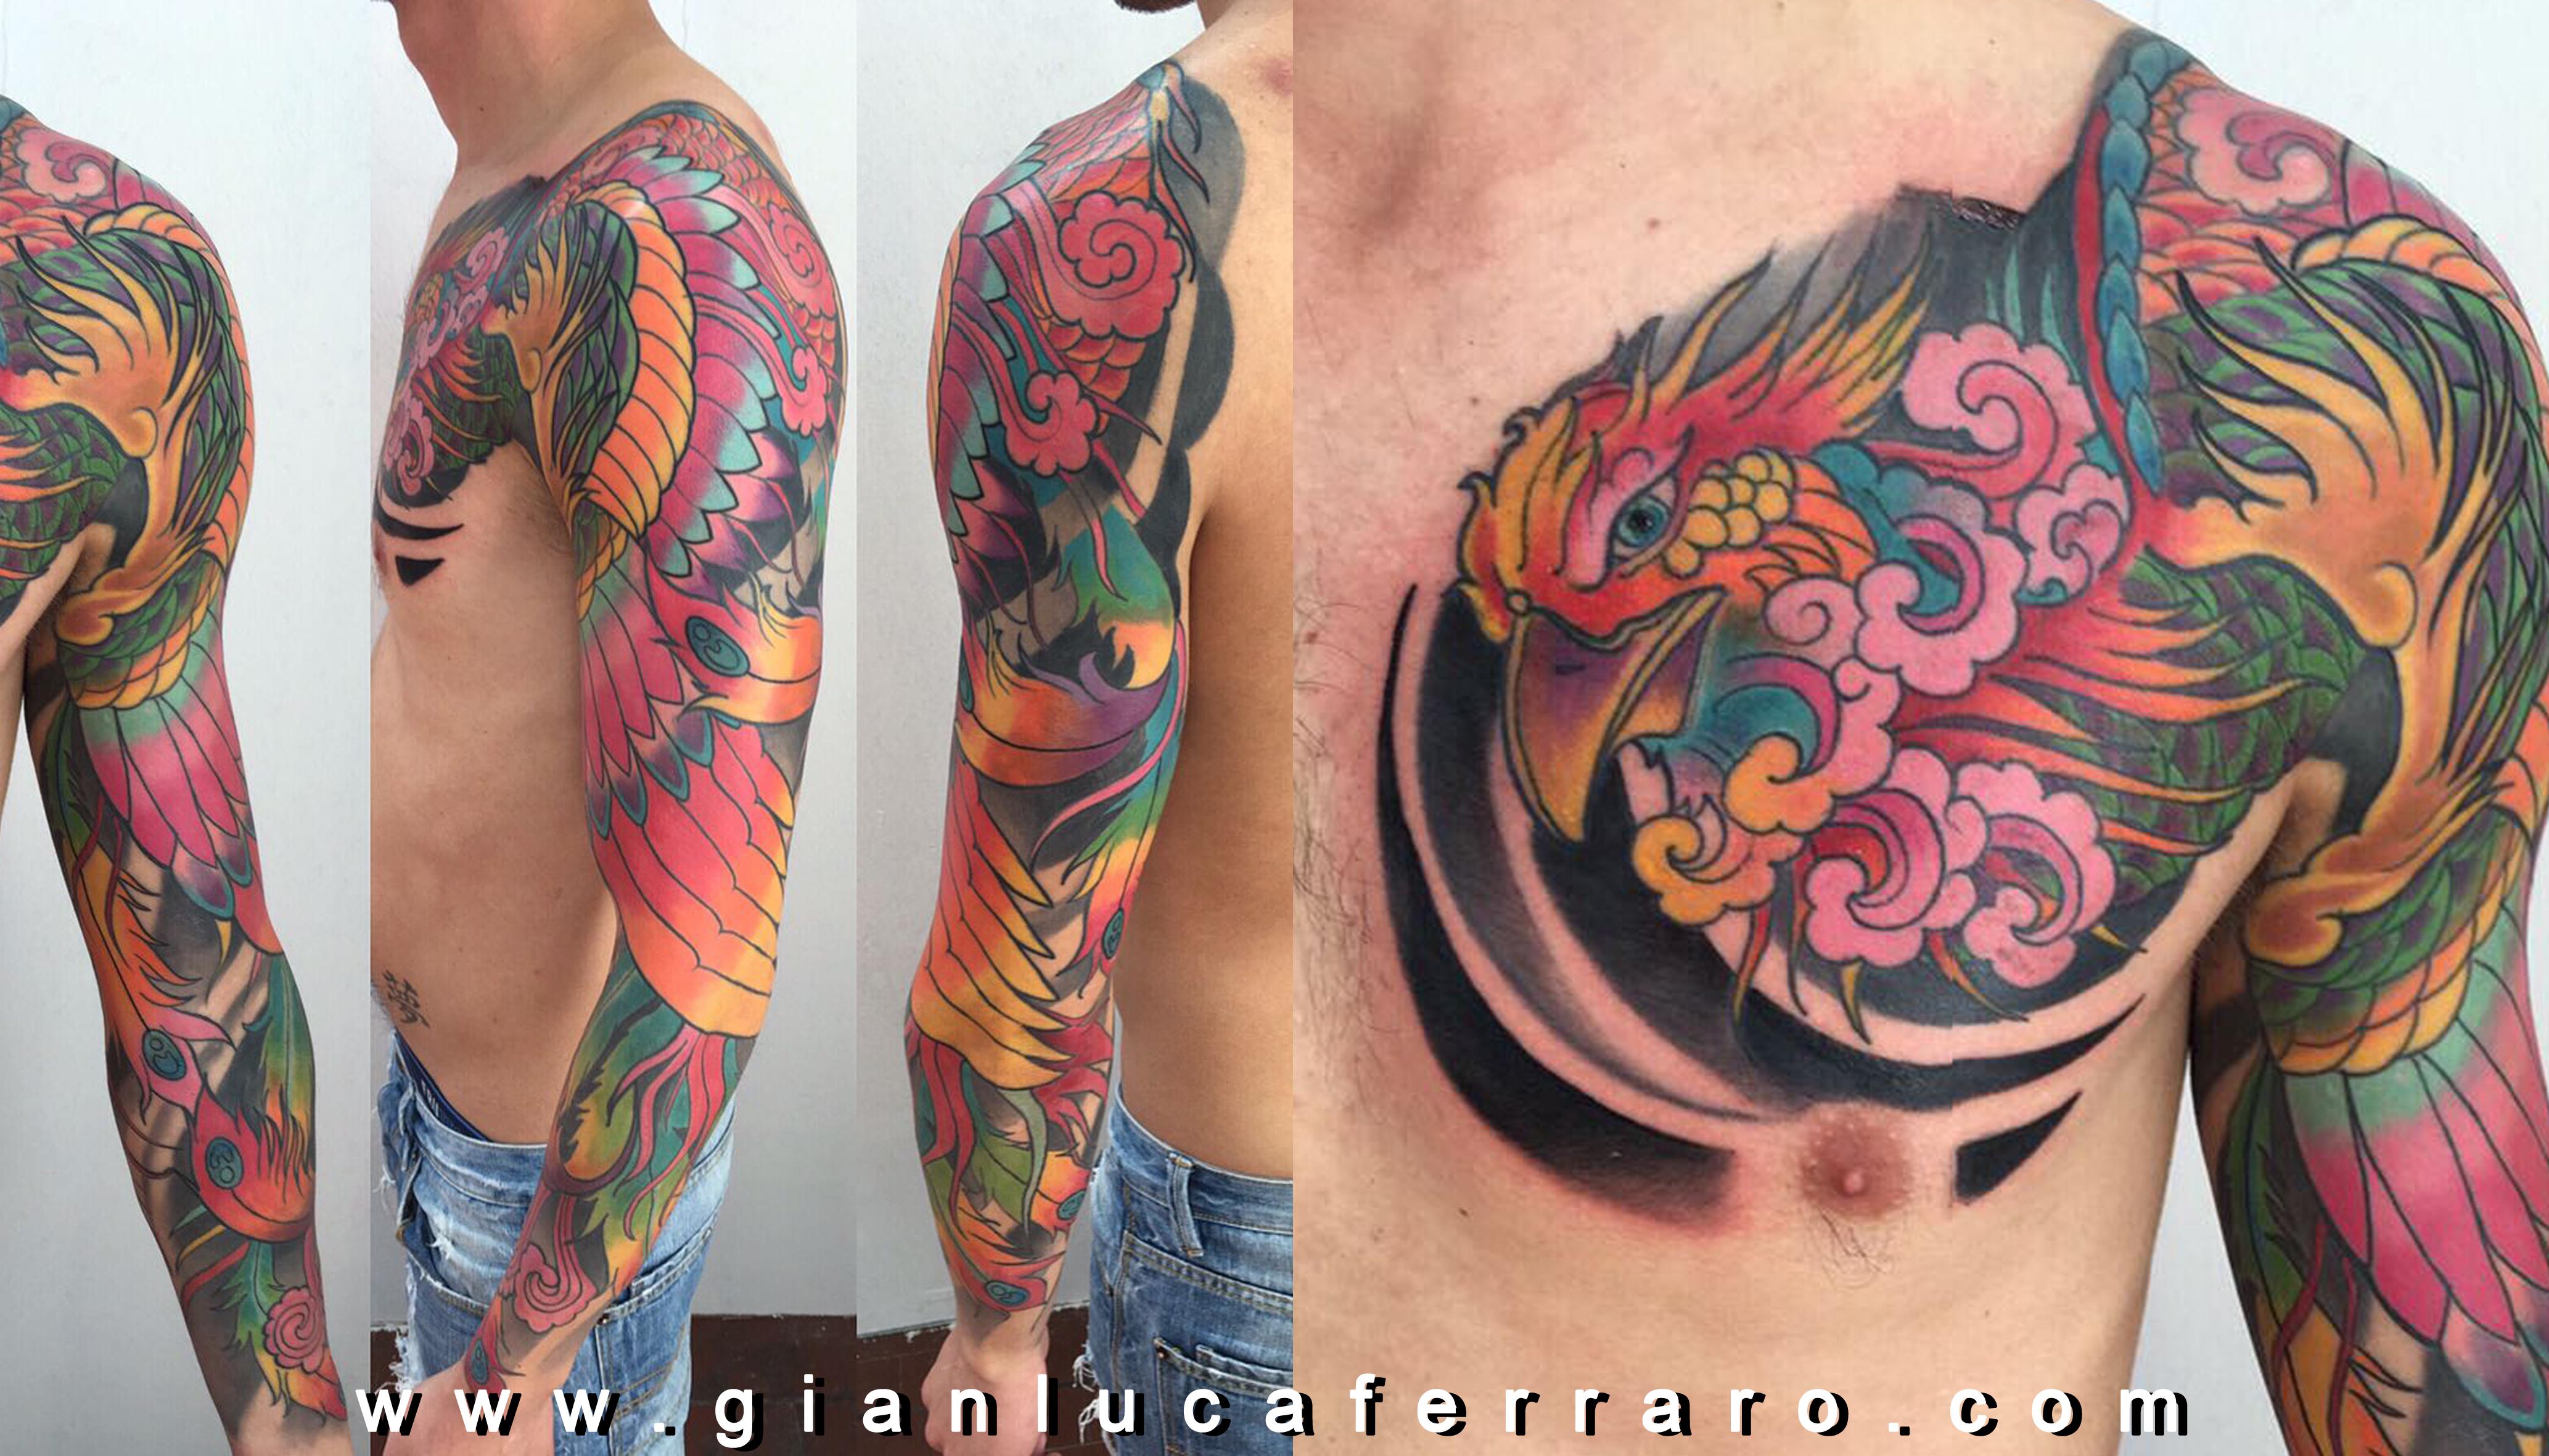 japan_gianluca_ferraro_tattoo_artist_black_and_grey_realistic_napoli_italia sito2